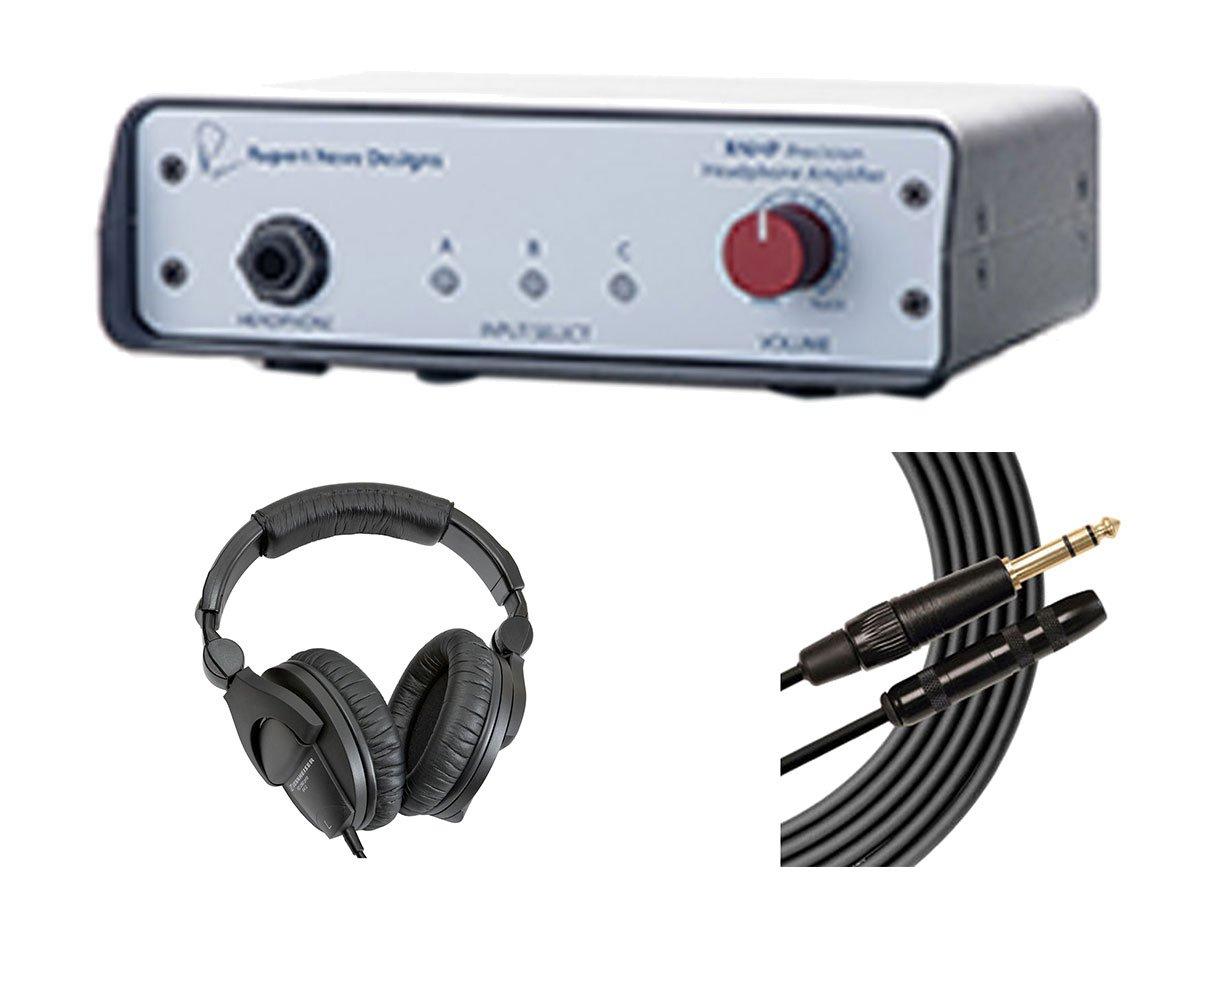 Rupert Neve Designs RNHP Headphone Amplifier + HD 280 PRO + Mogami Extension